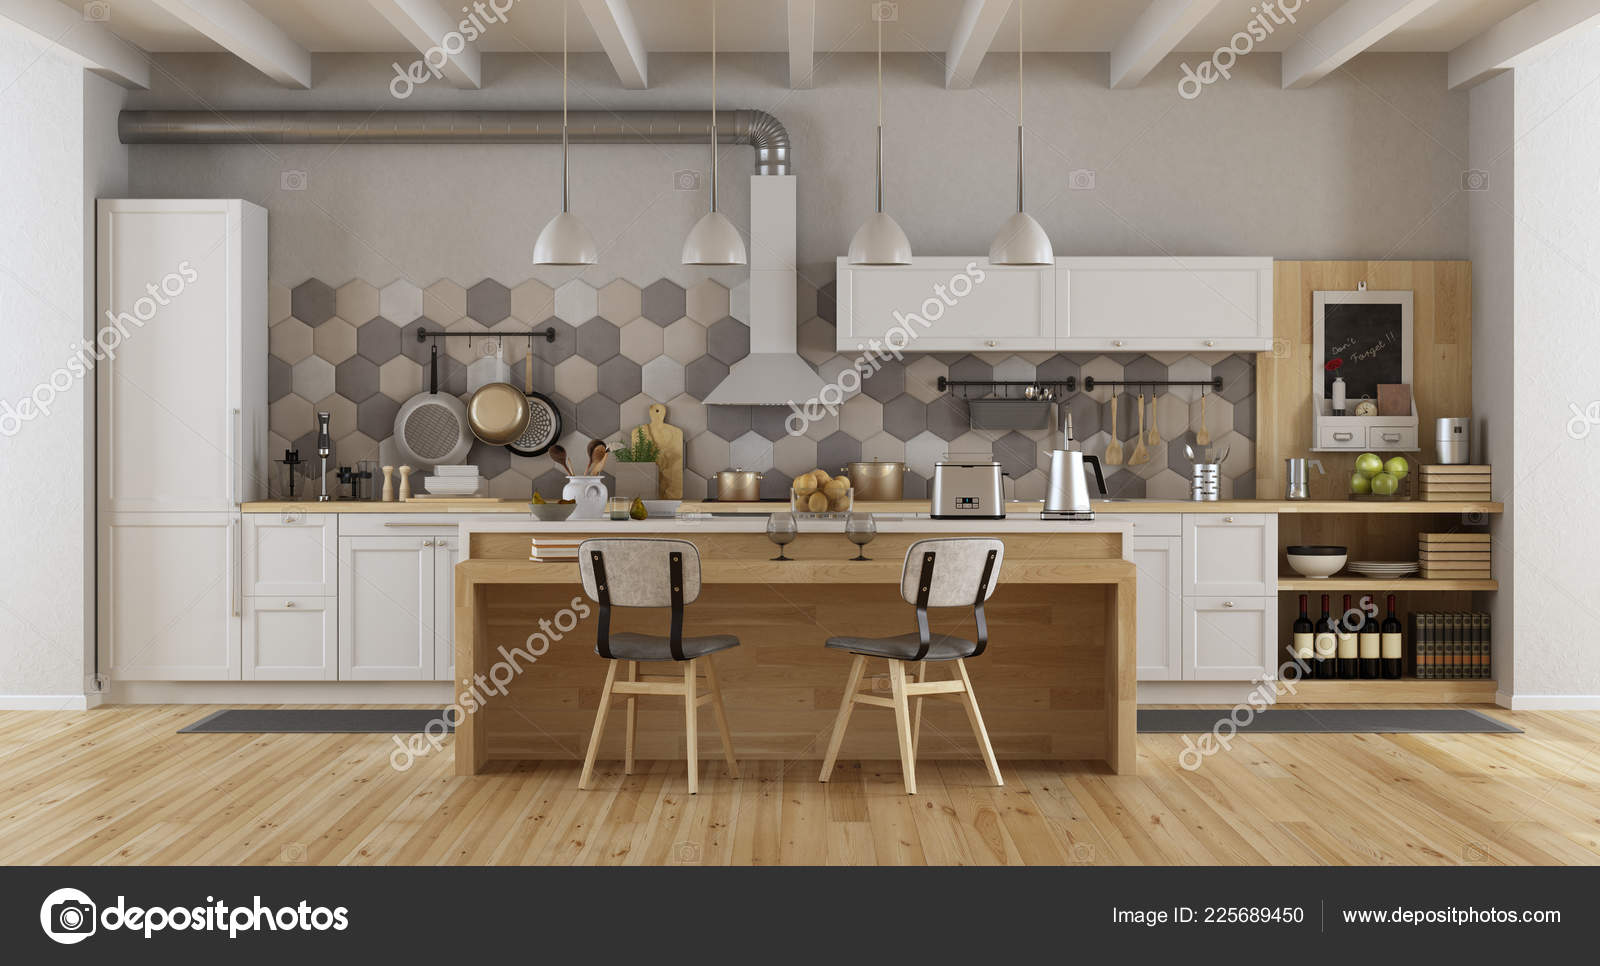 islands for the kitchen refurbished kitchens sale 复古白色和木制厨房与岛屿和椅子 图库照片 c archideaphoto 225689450